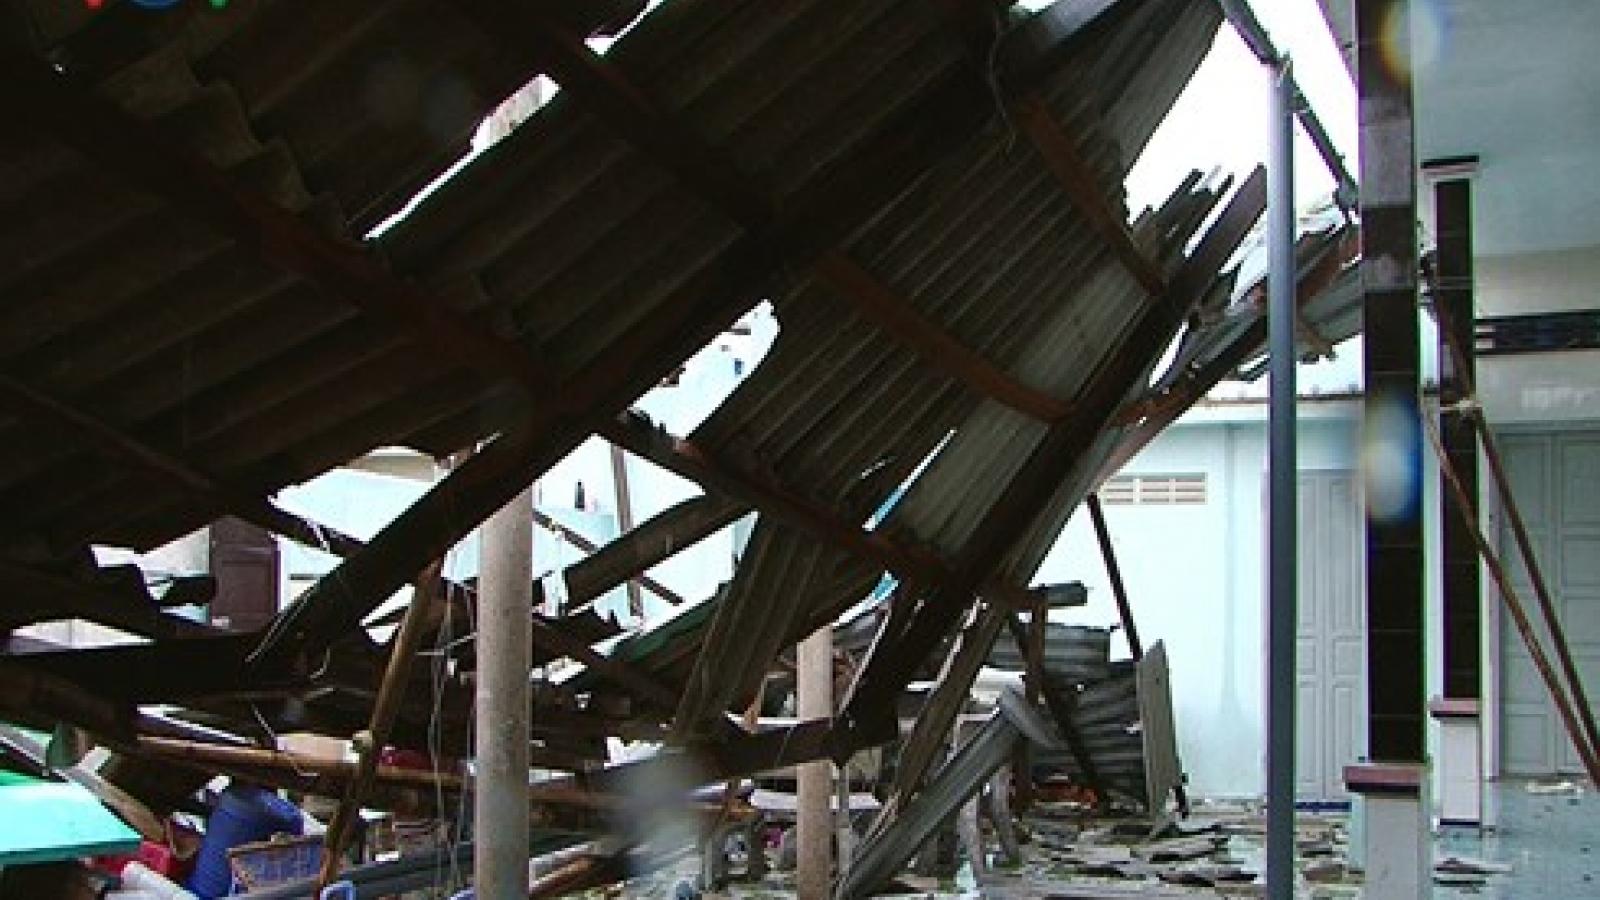 Tornado causes severe damage on Phu Quy Island